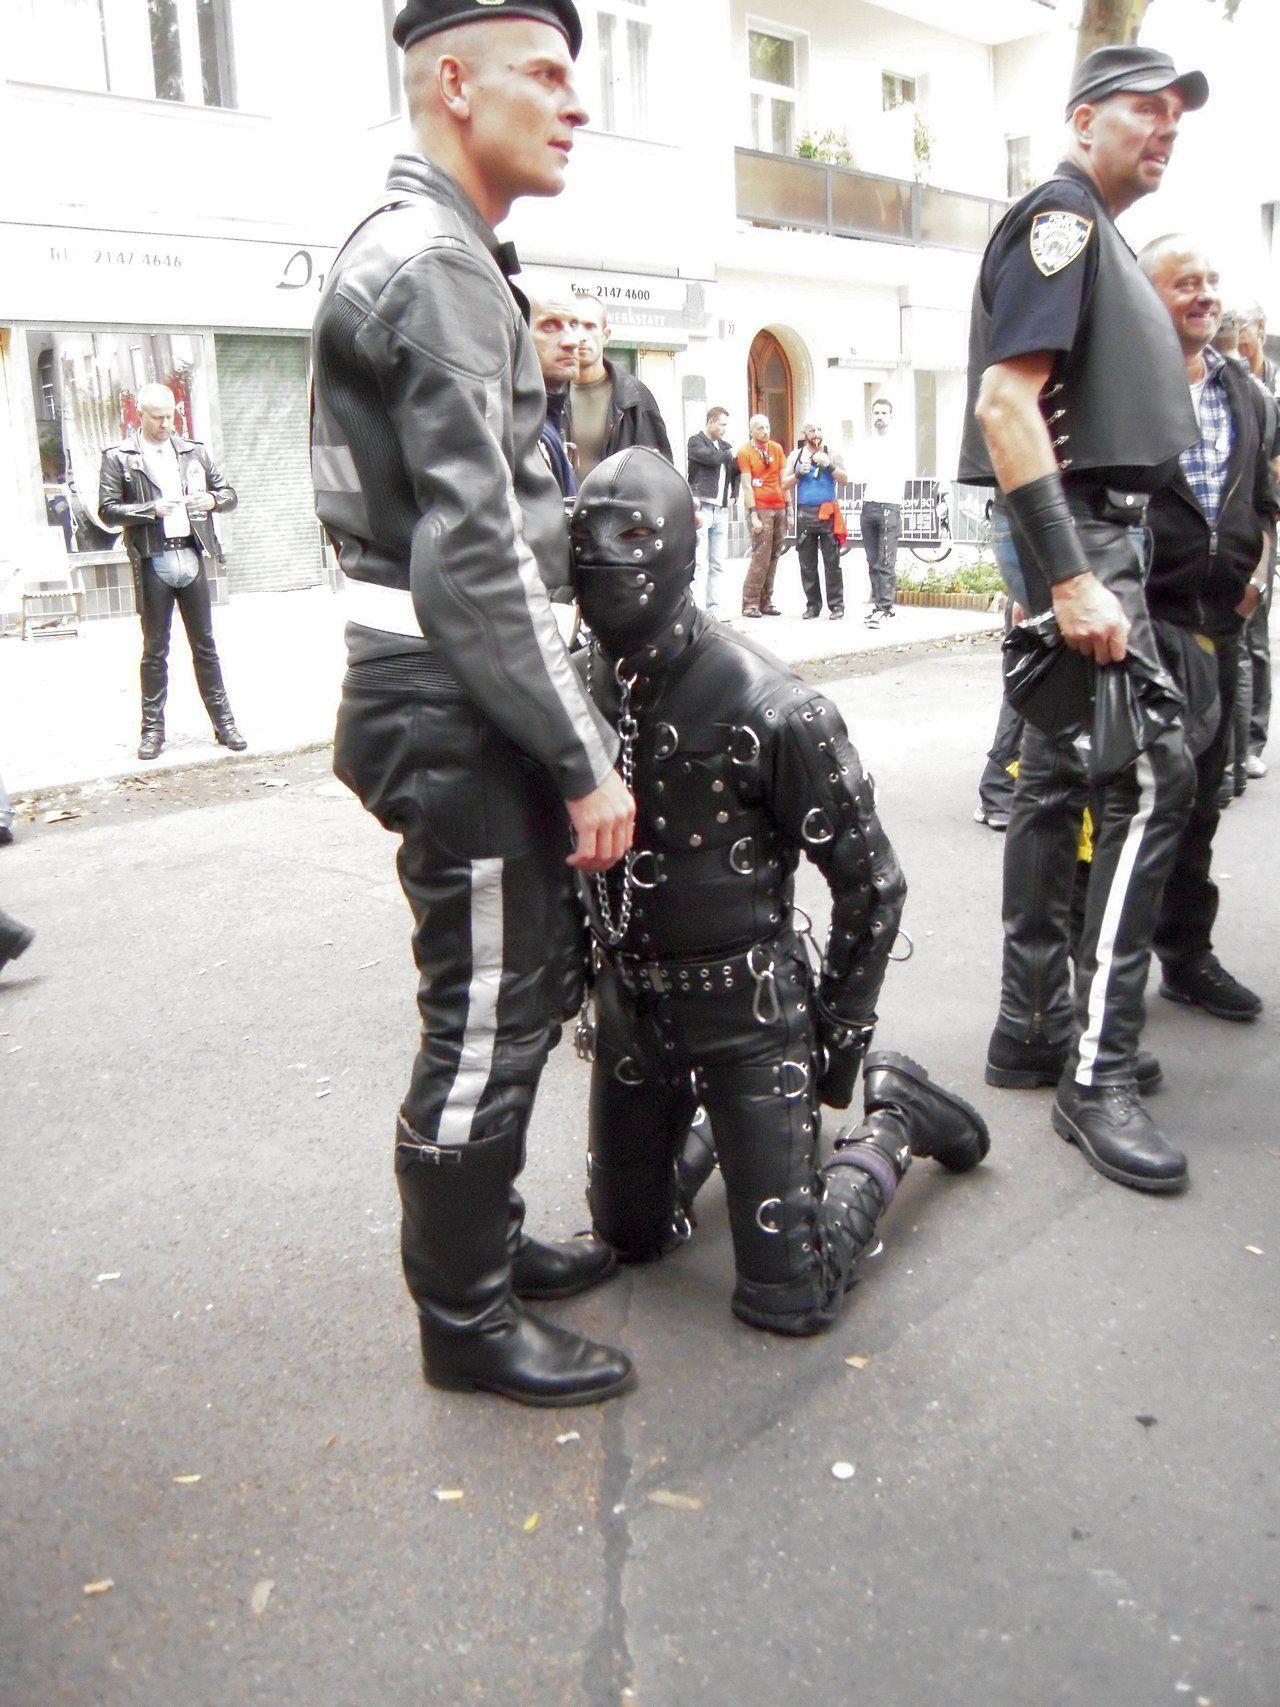 Gay police tumblr